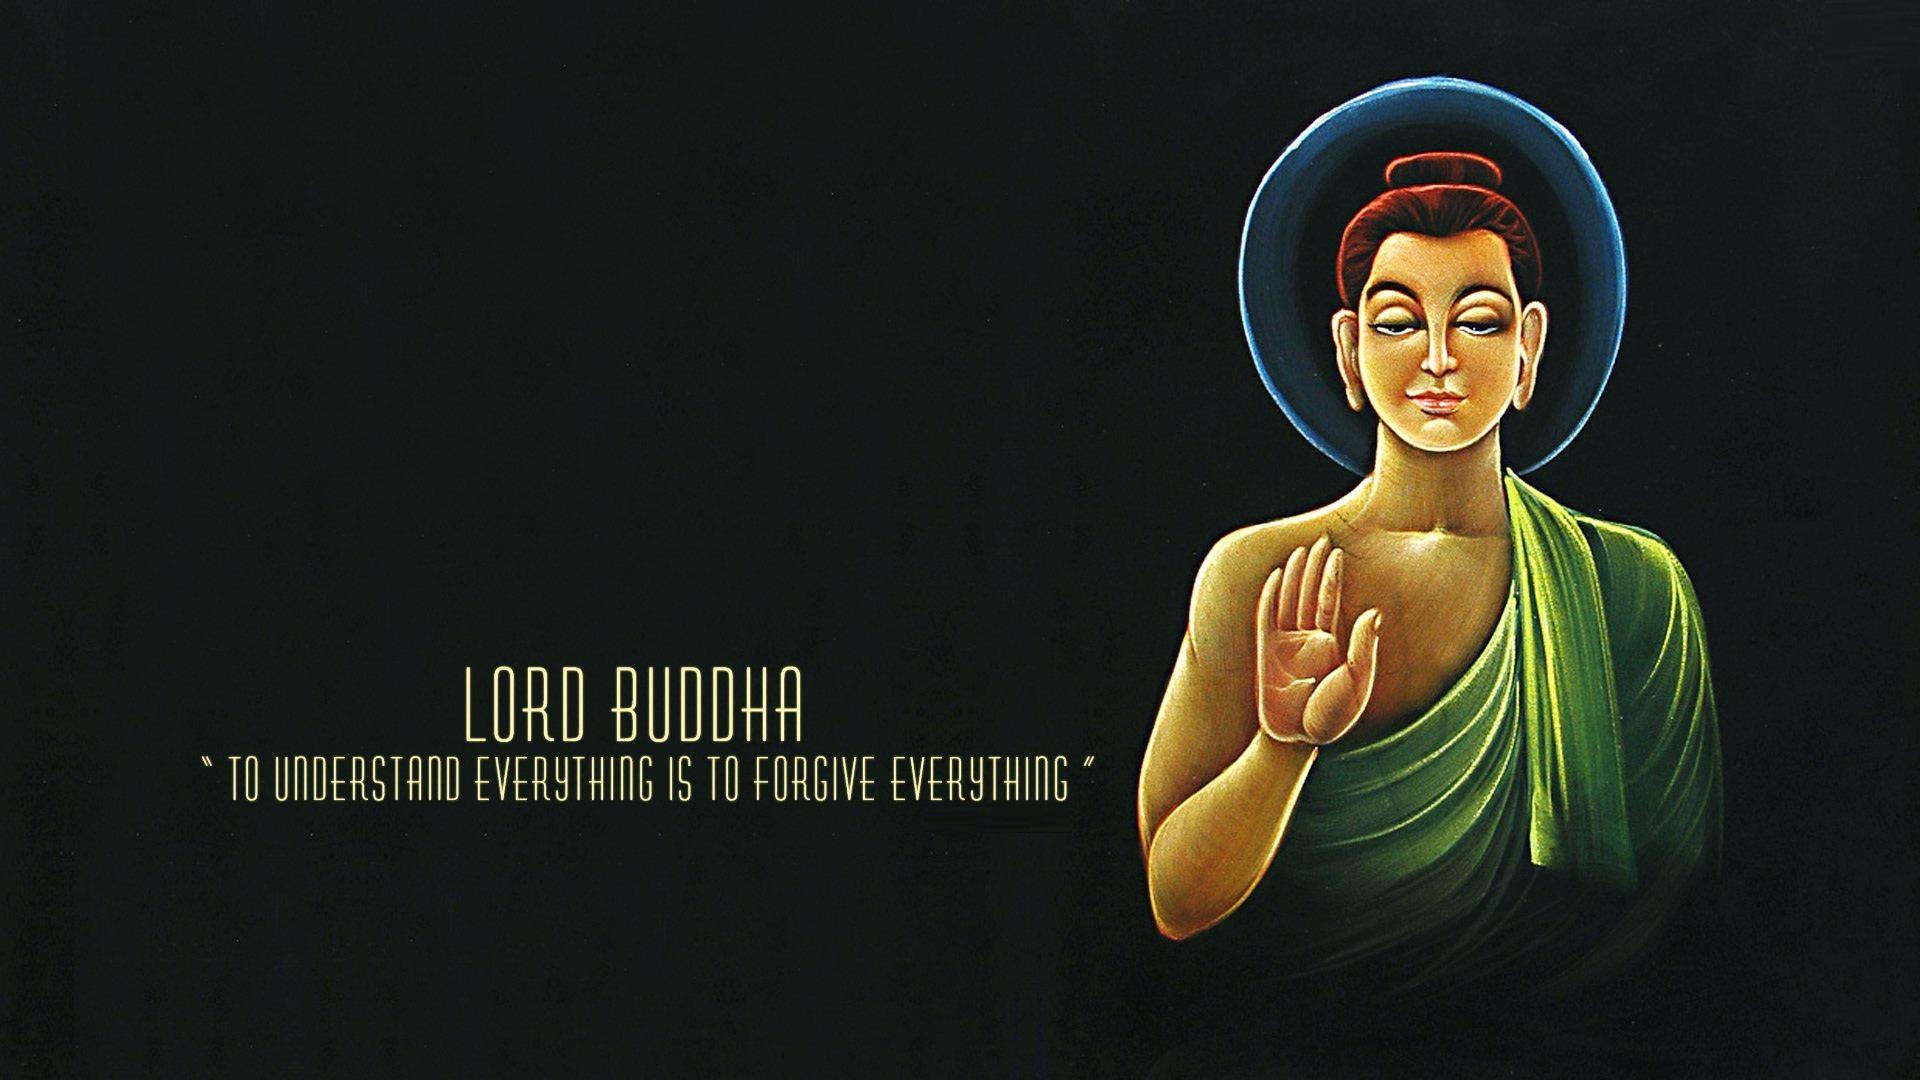 Buddha Wallpaper 1920x1080 79 Images